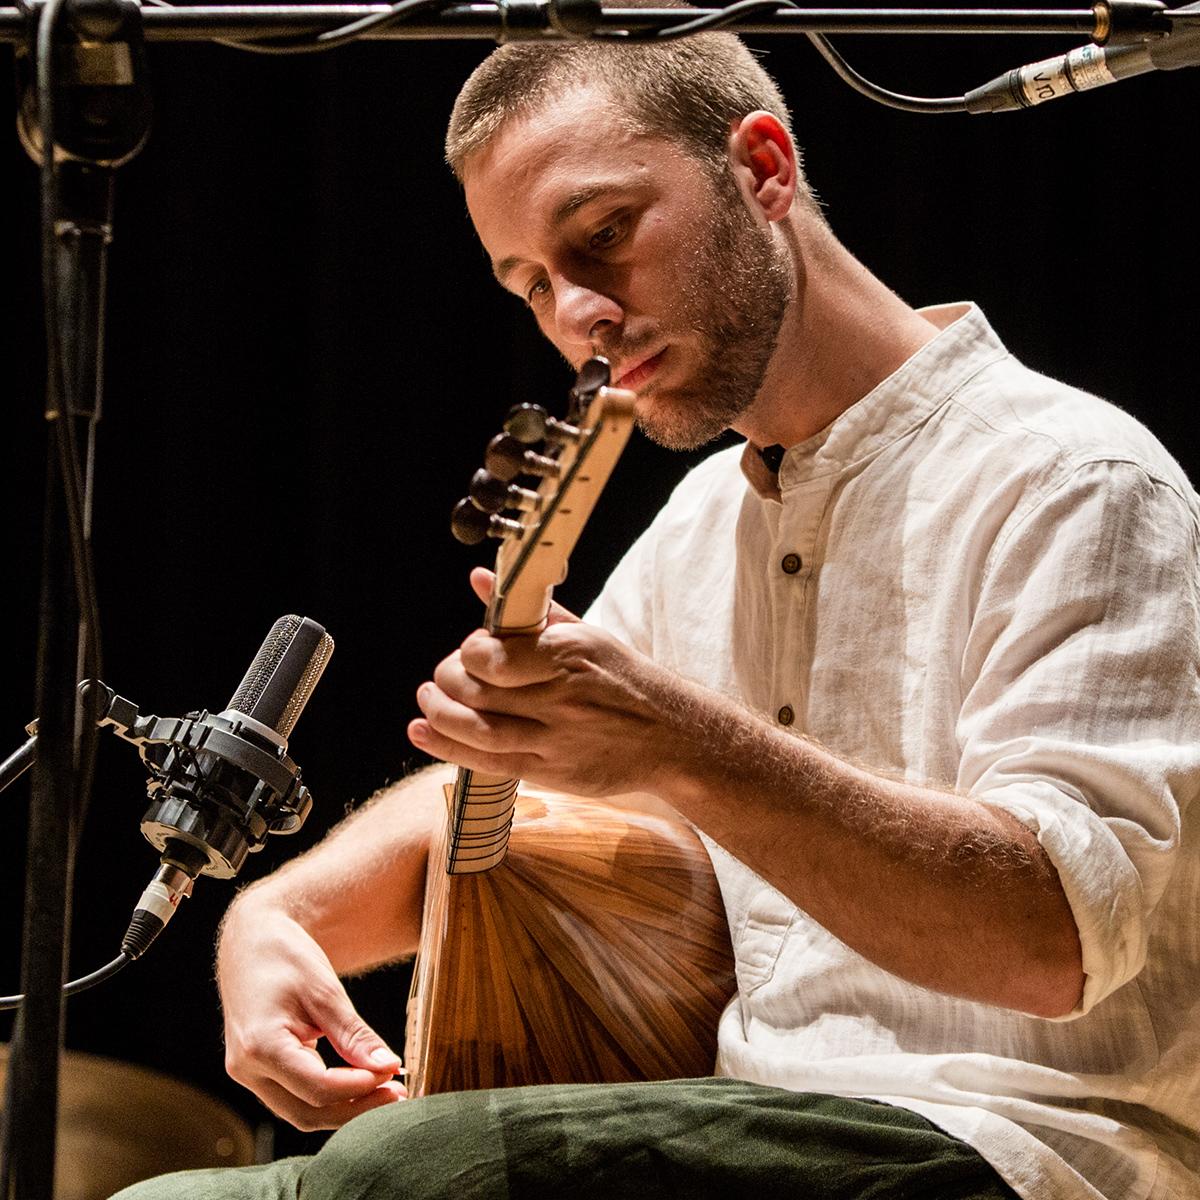 Jaume Paladero Besarabia Valencia Balkan music